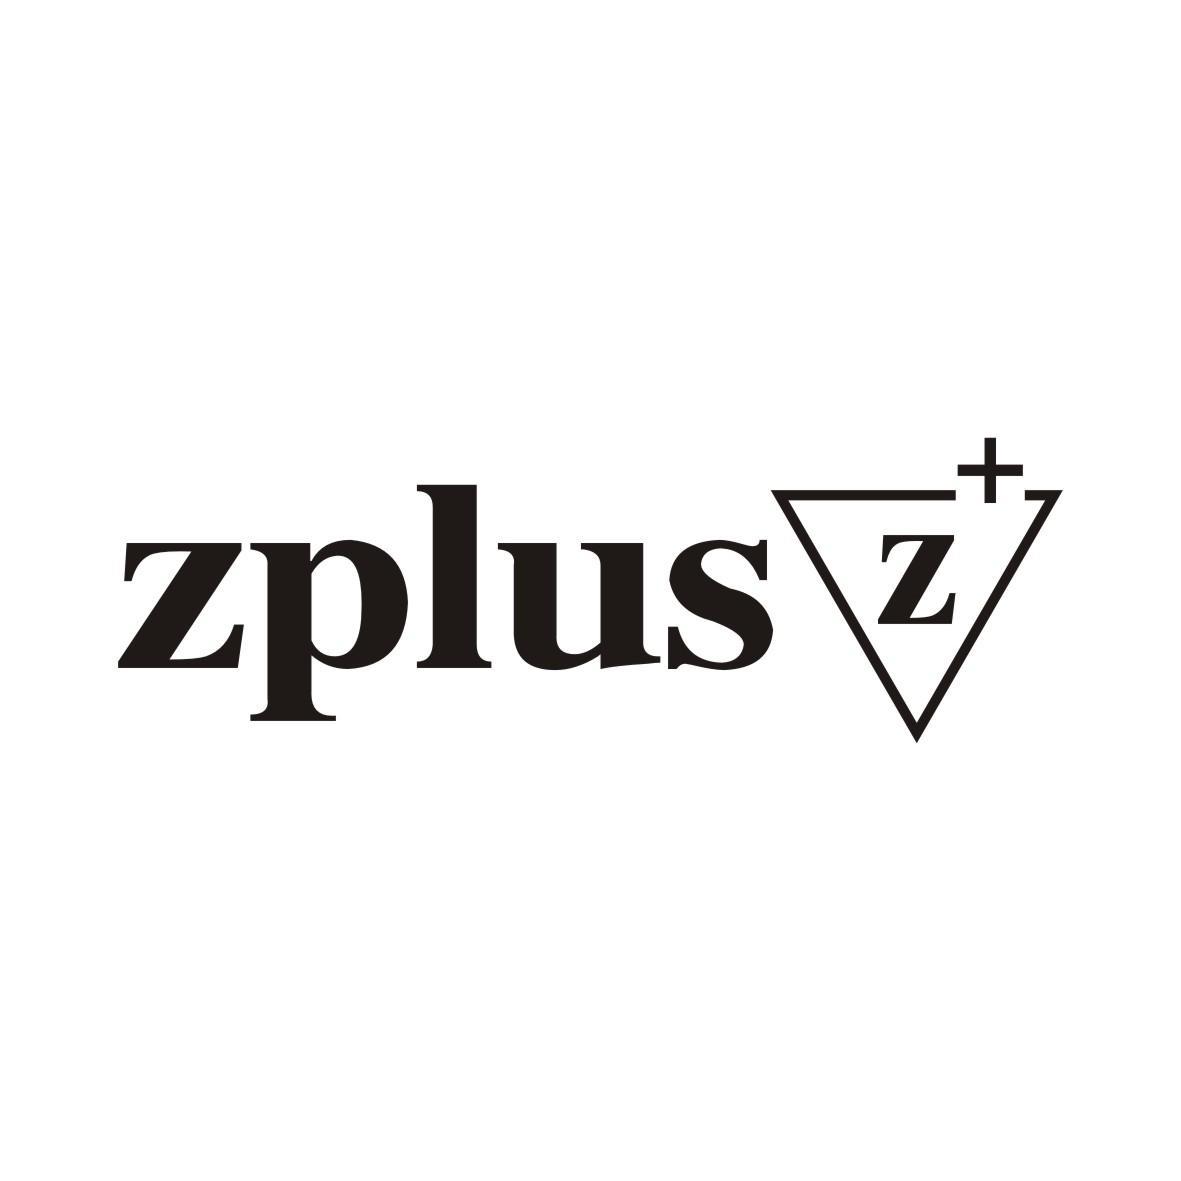 ZPLUS